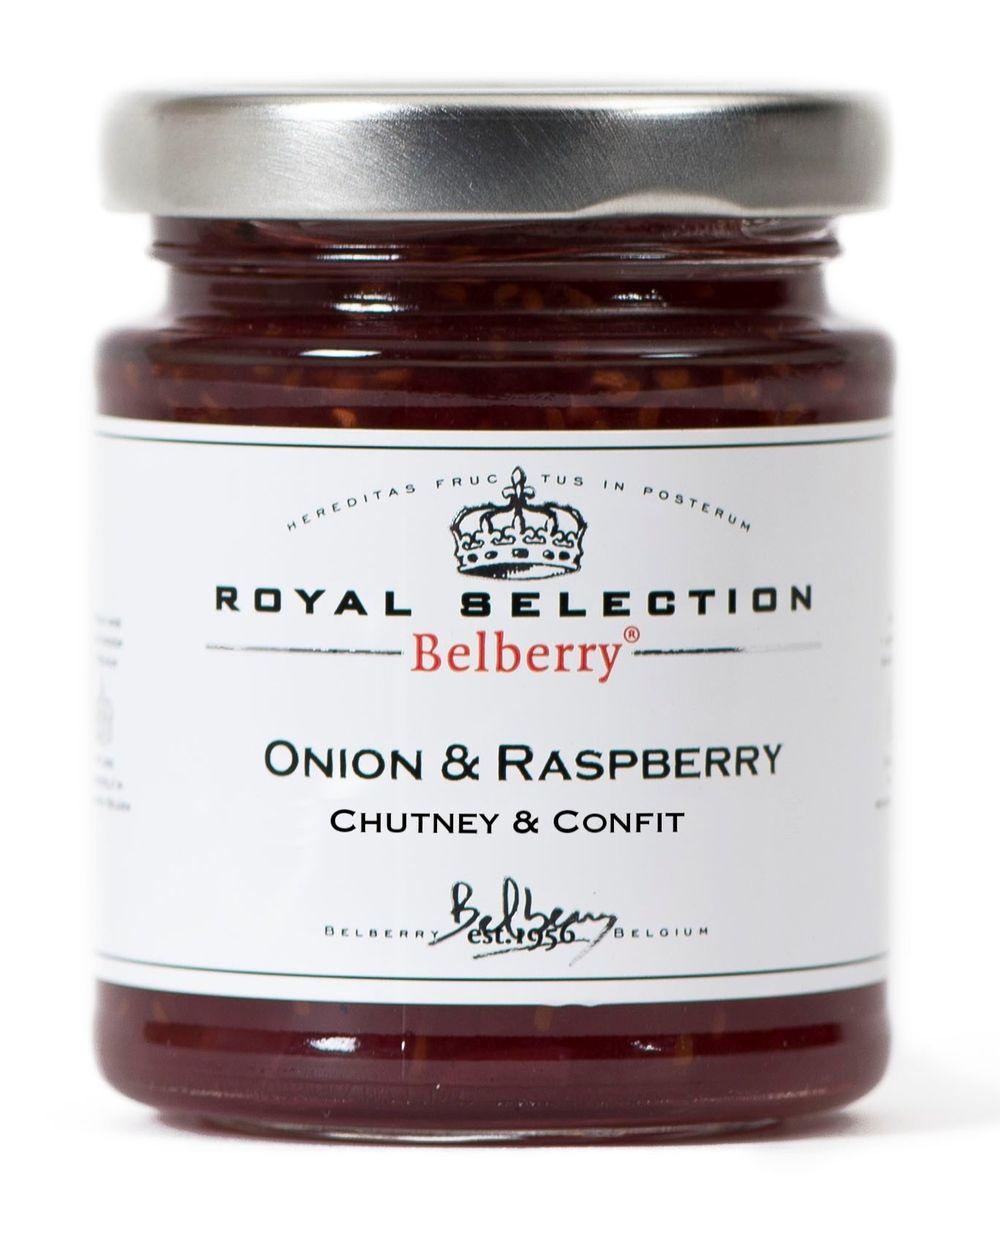 Onion & Raspberry Confit